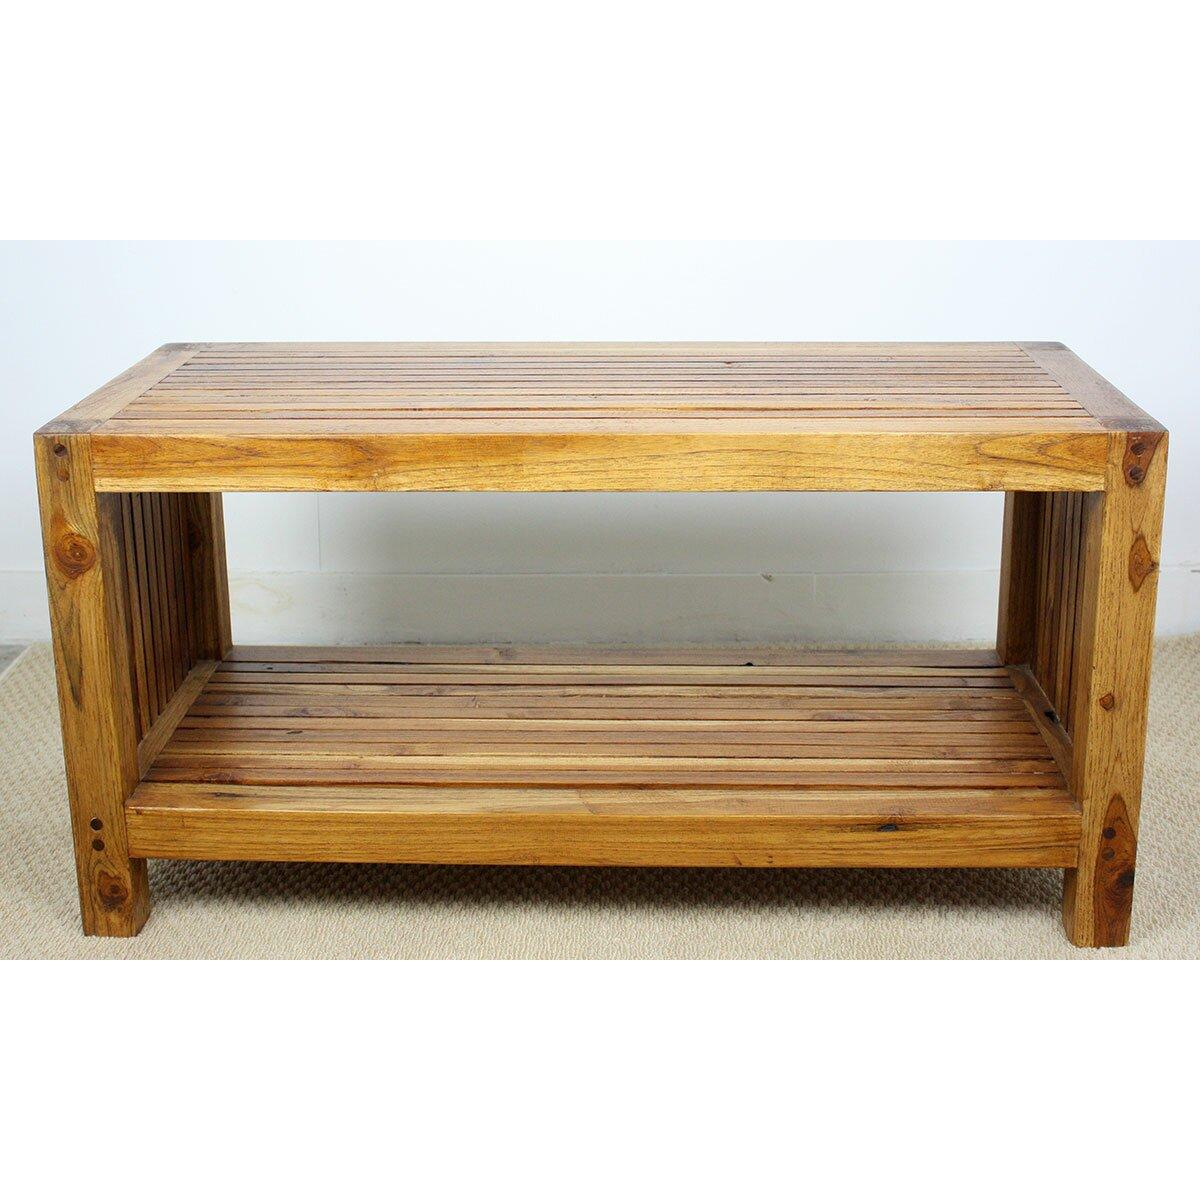 Slatted Coffee Table Strata Furniture Teak Slat Coffee Table Reviews Wayfair